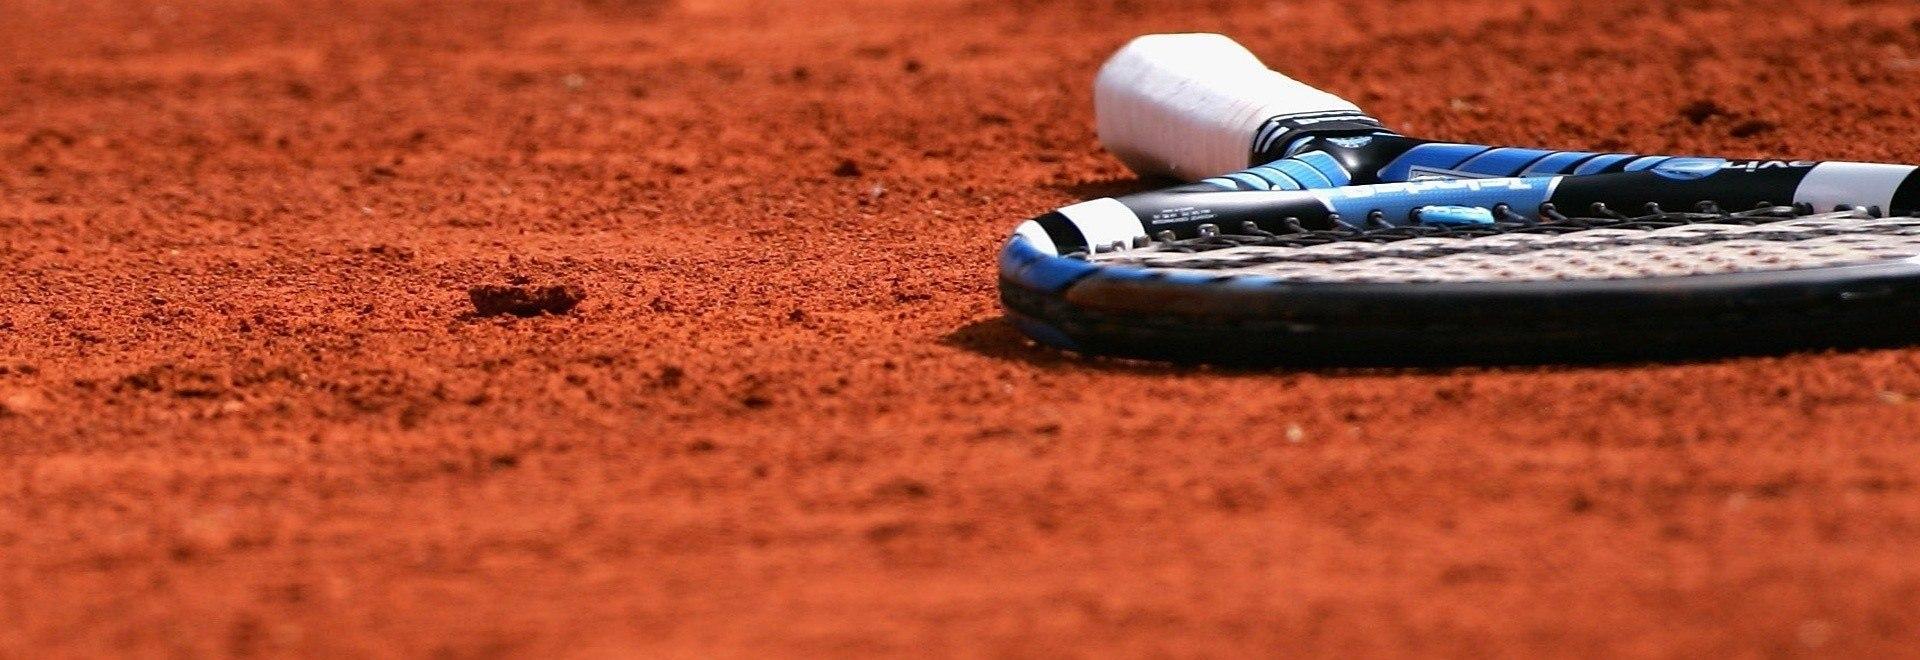 ATP World Tour Masters 1000 HL 2012